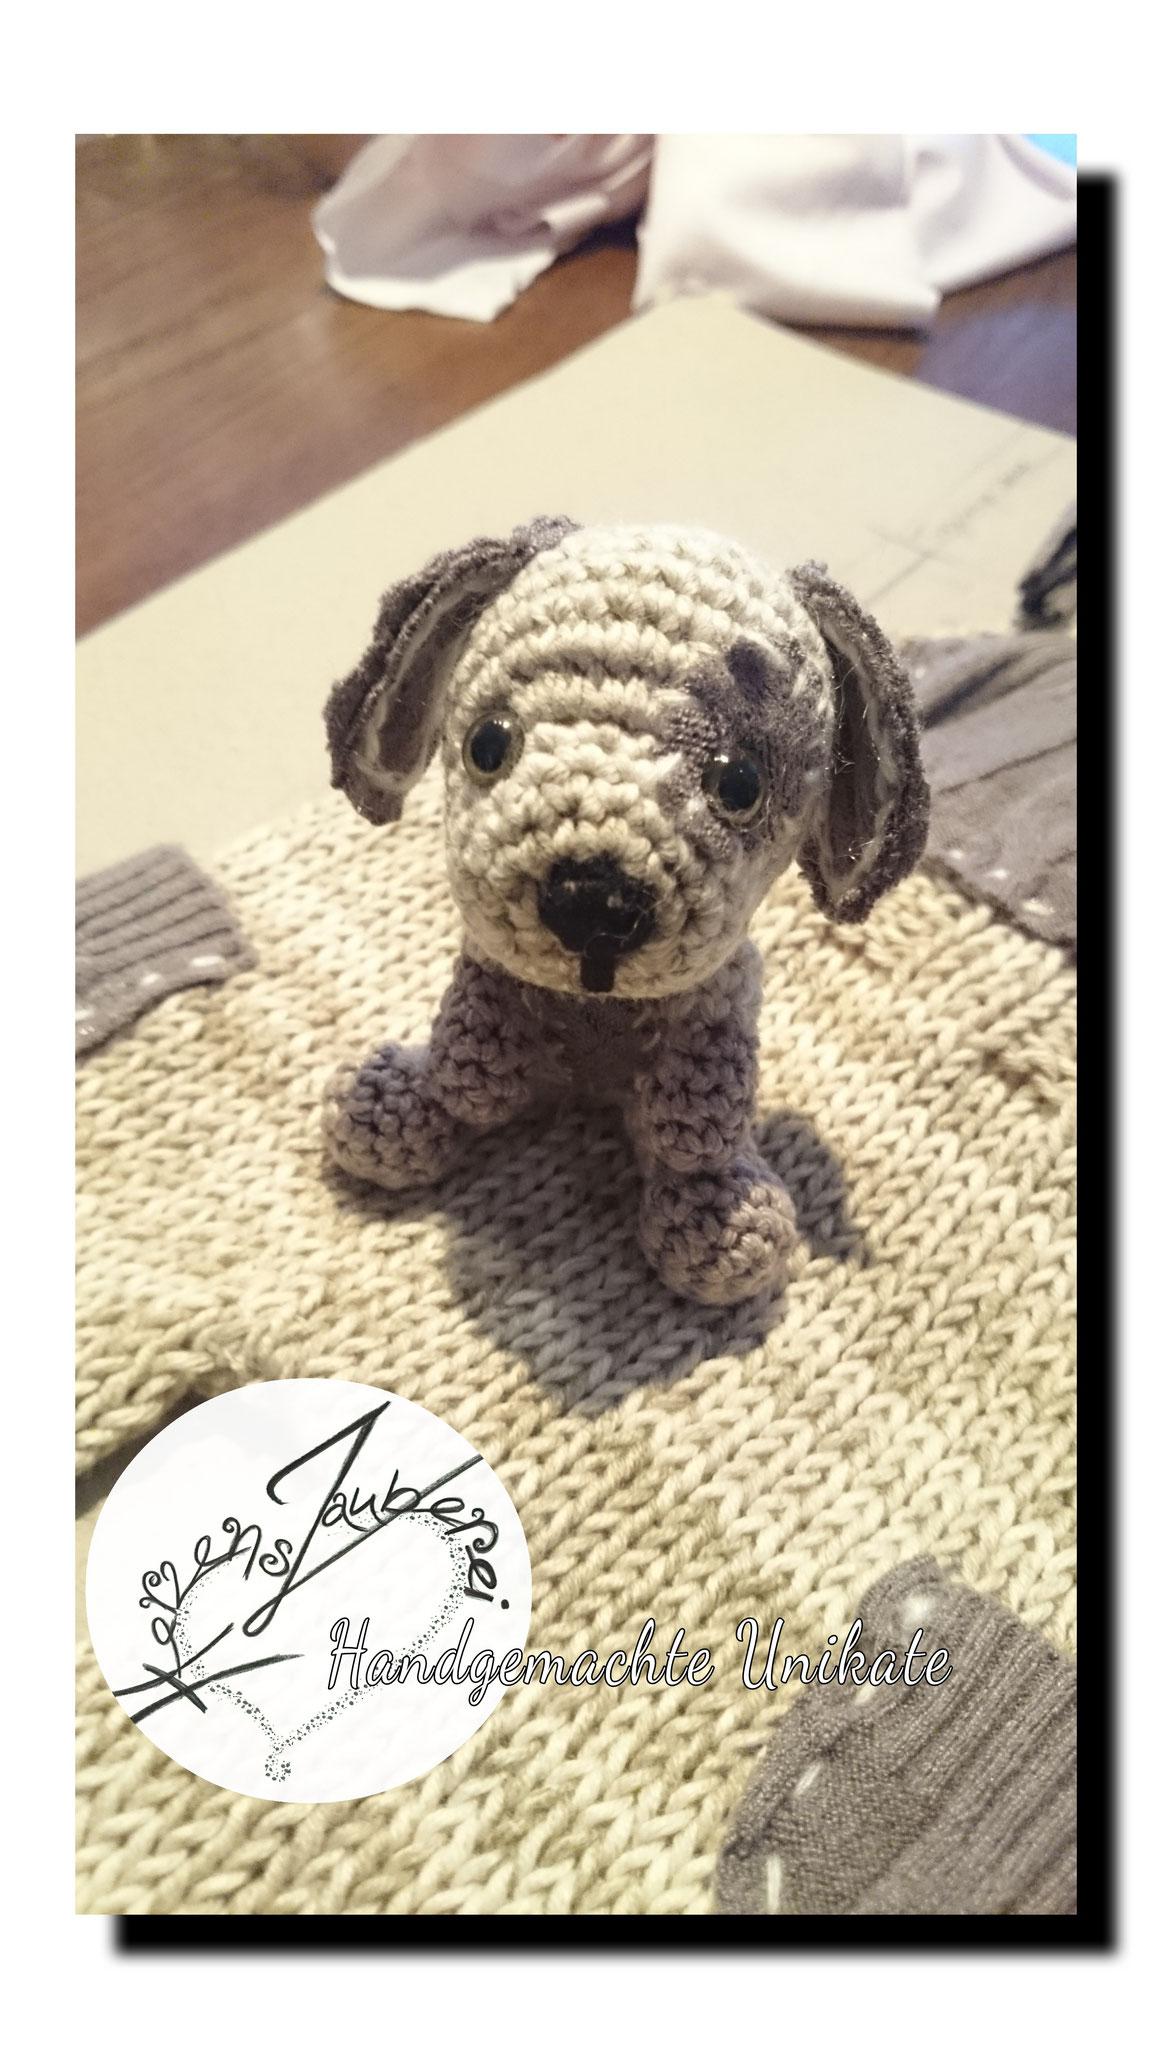 Kleiner Hund als Shootingstar, ca. 8cm gross, Chf 35.-